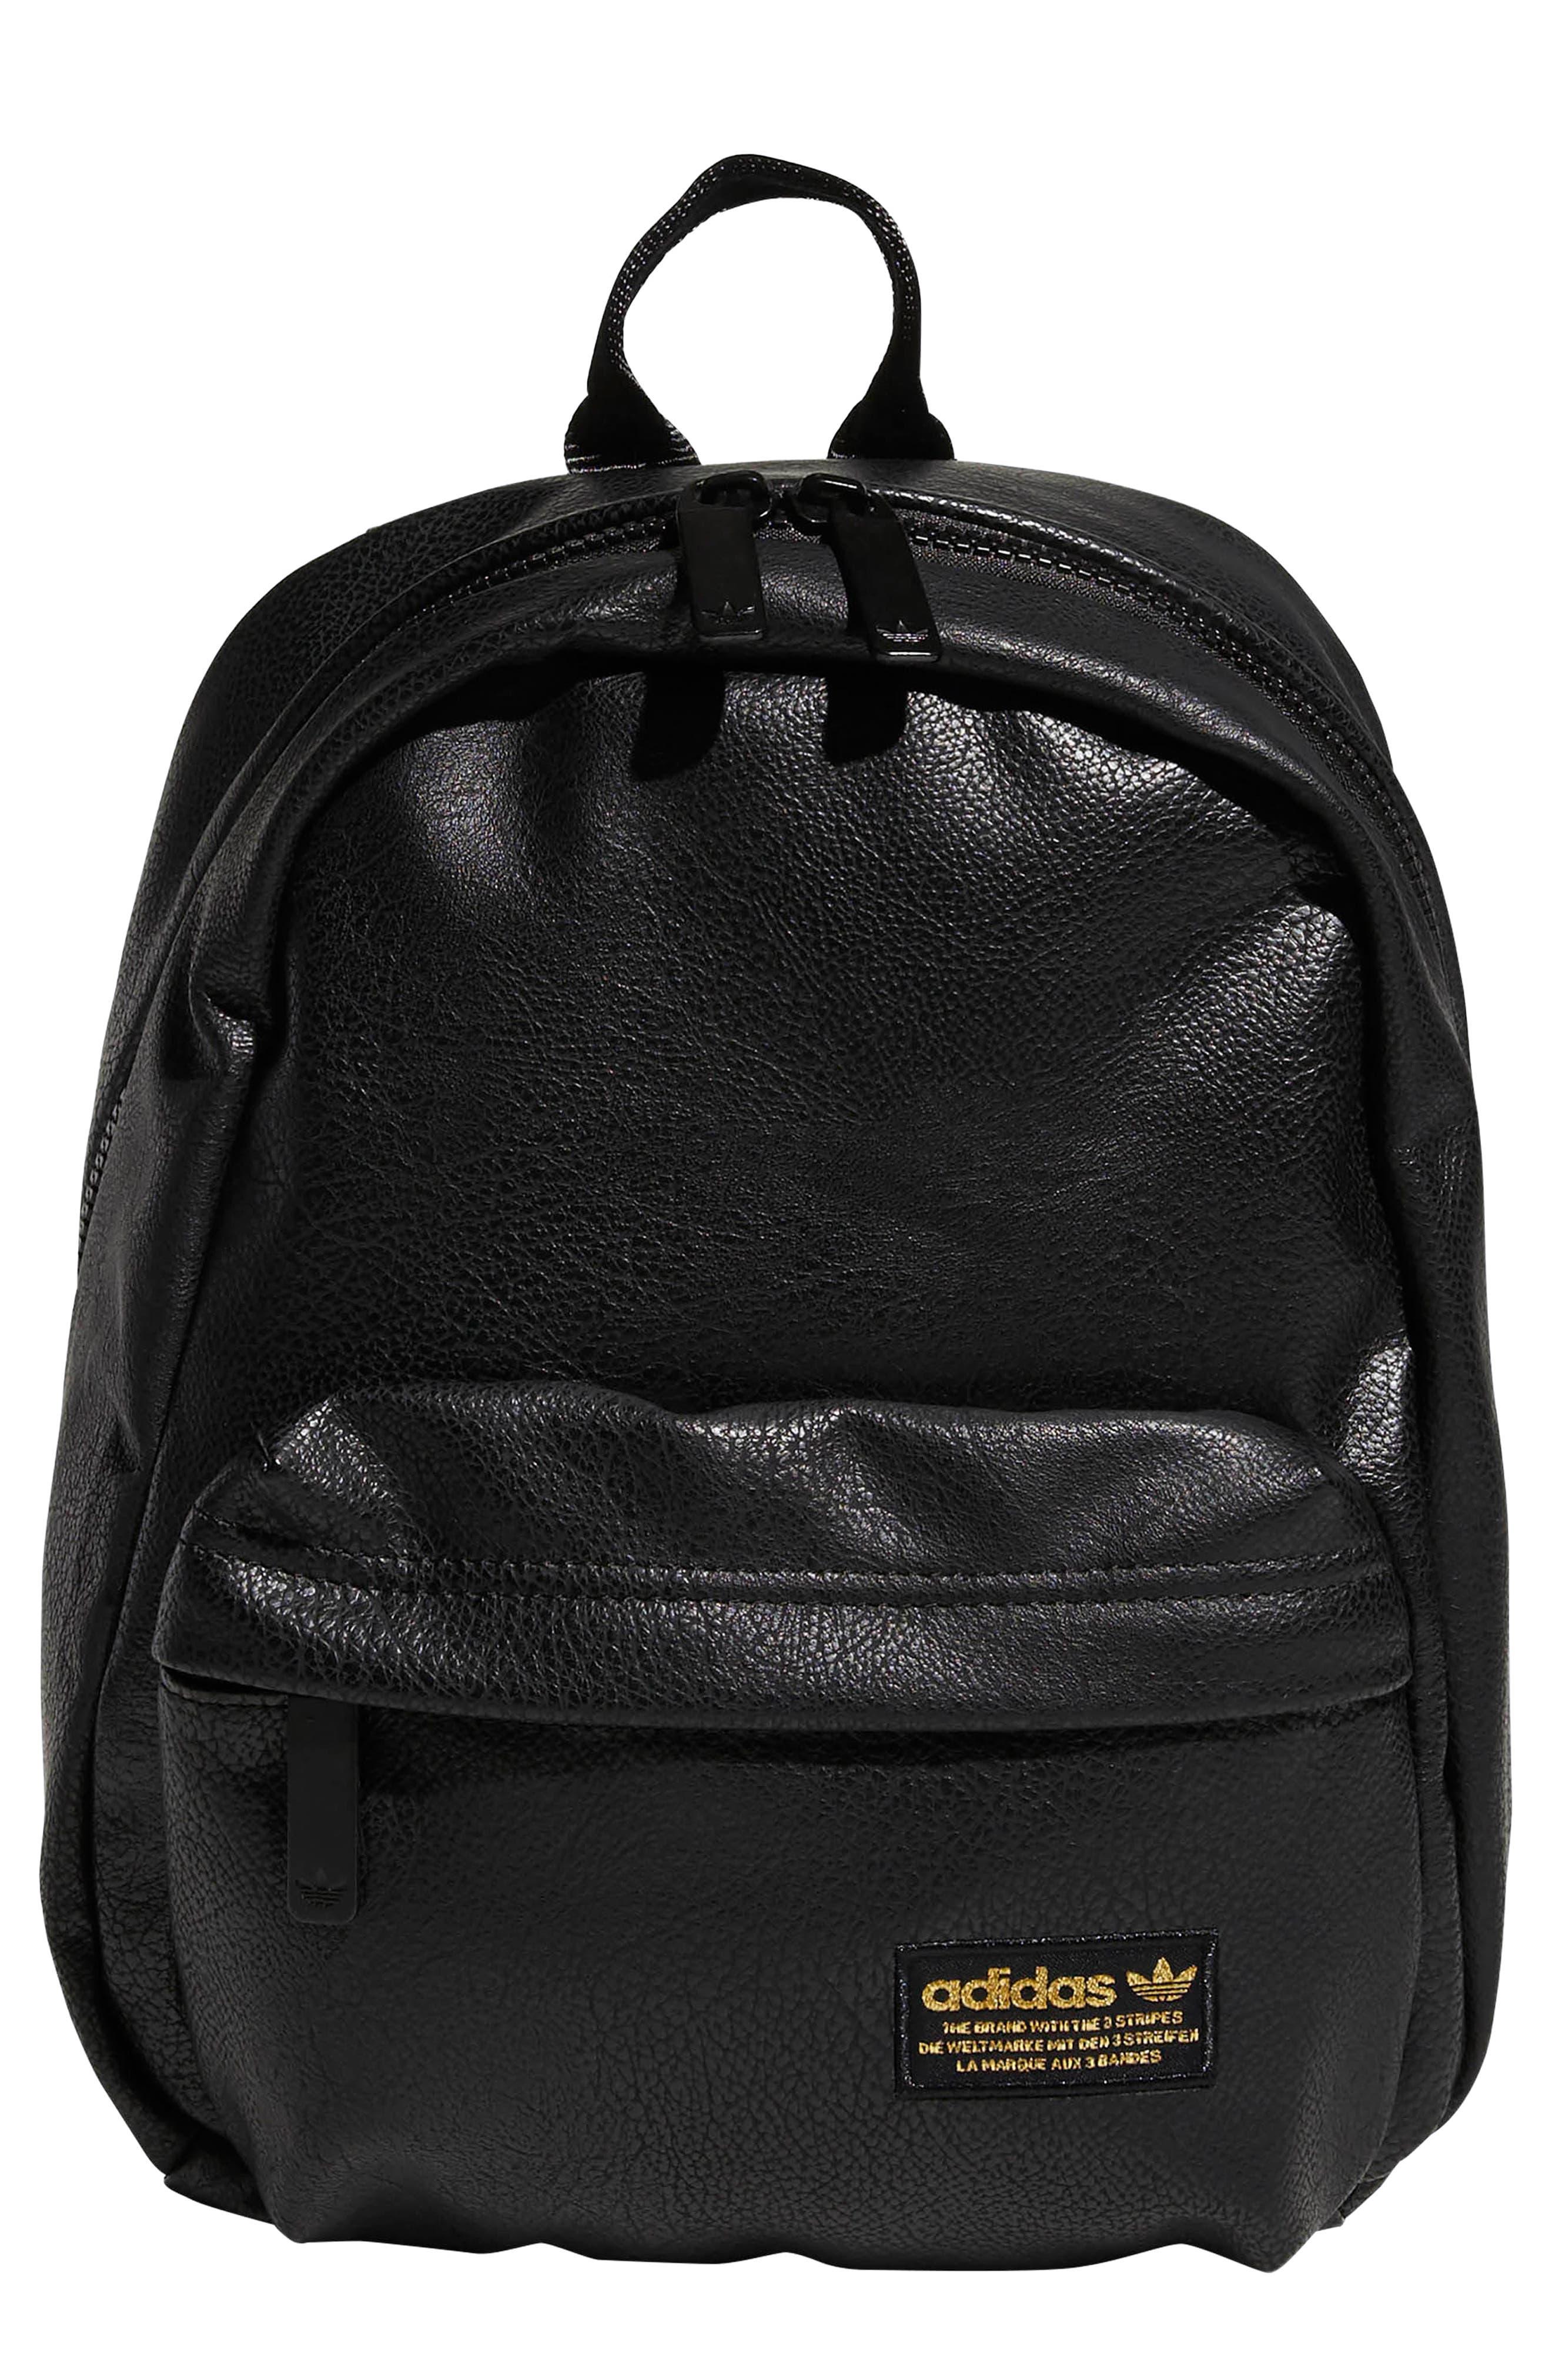 ADIDAS ORIGINALS National Compact Backpack, Main, color, 001